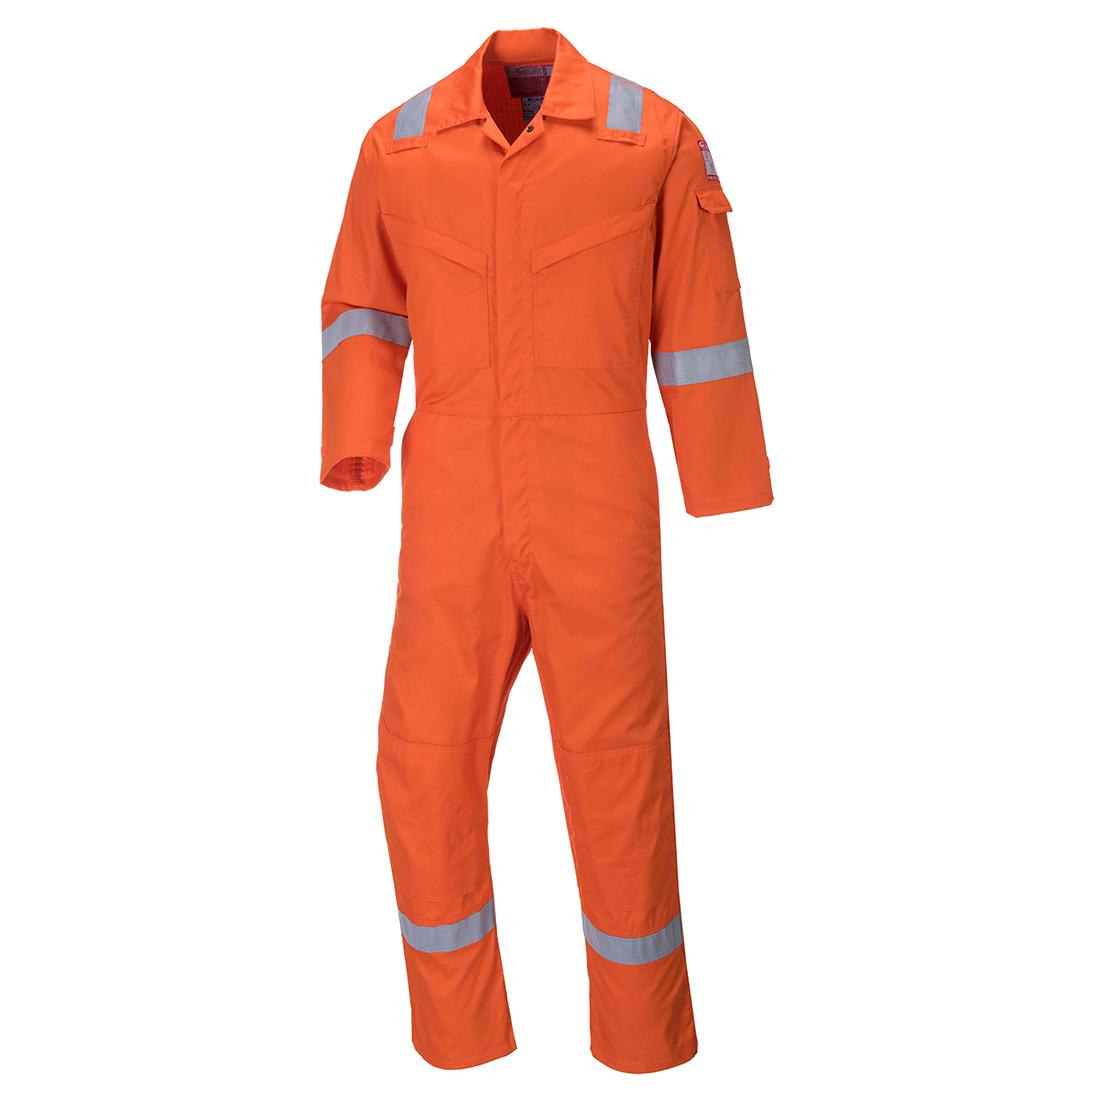 Aberdeen FR Coverall Orange 48